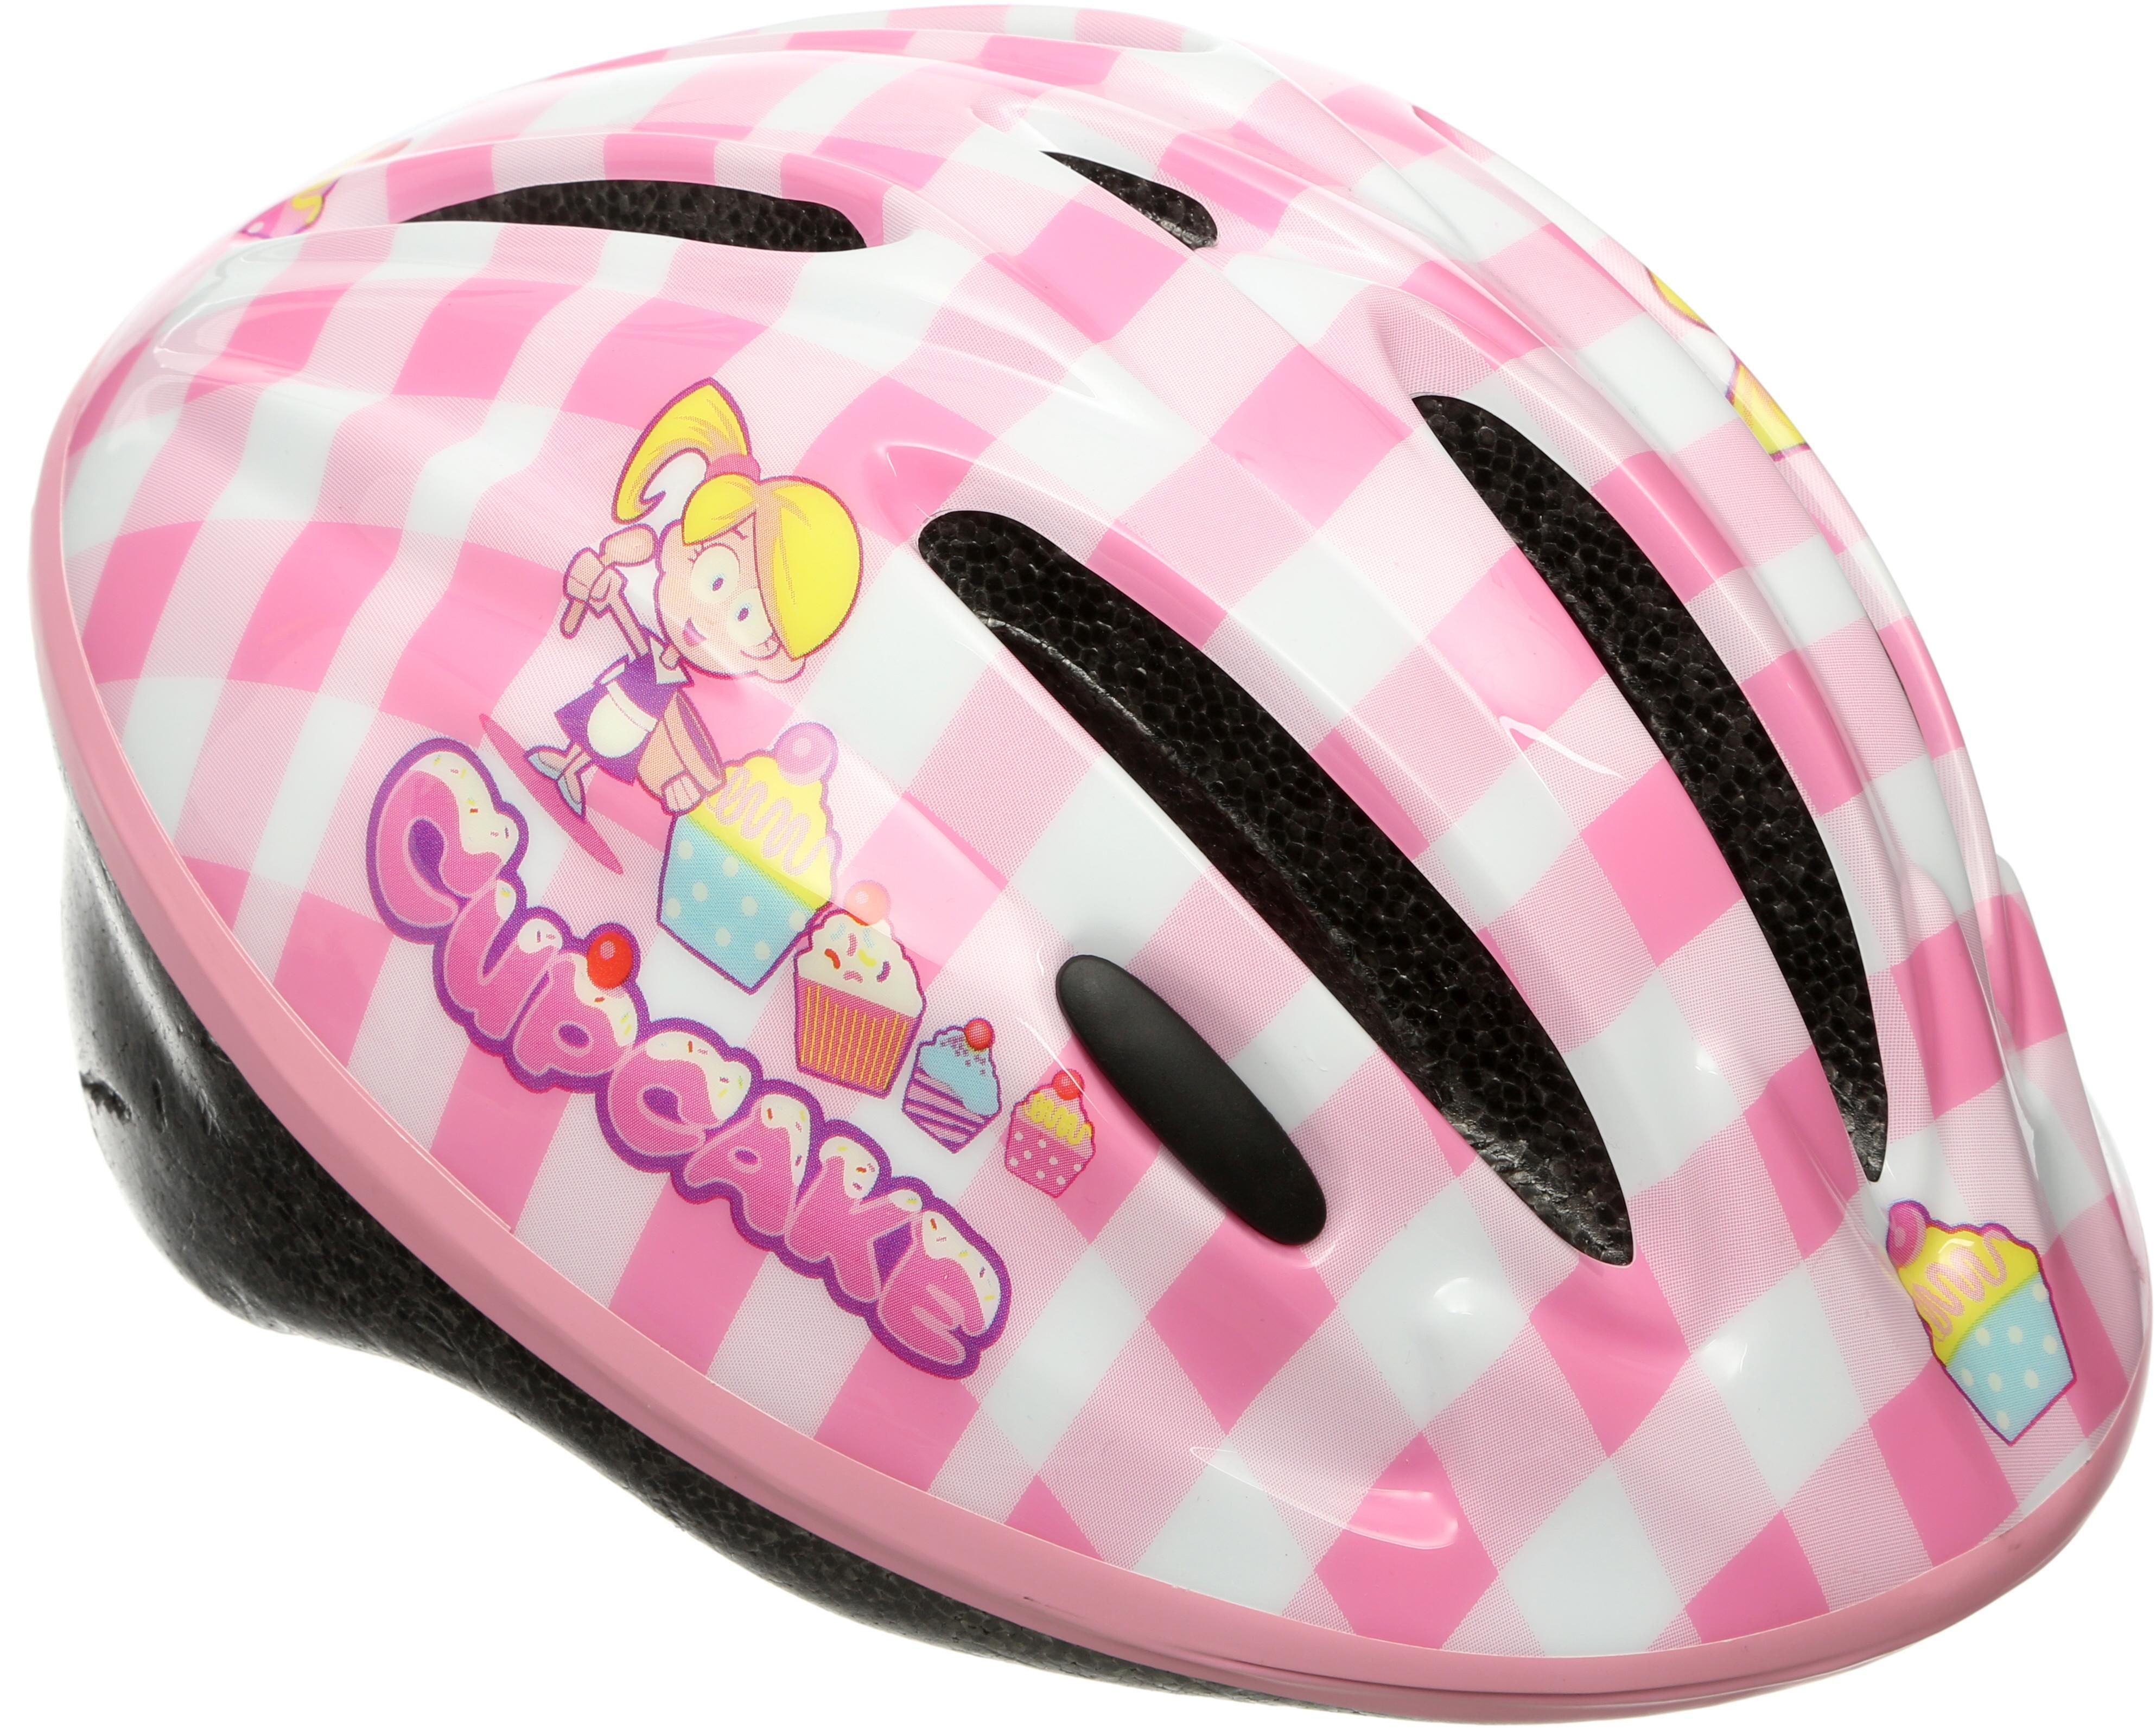 3b01072e4cb2 Apollo Cupcake Kids Bike Helmet (48-52cm) Childrens Bicycle Helm Adjustable